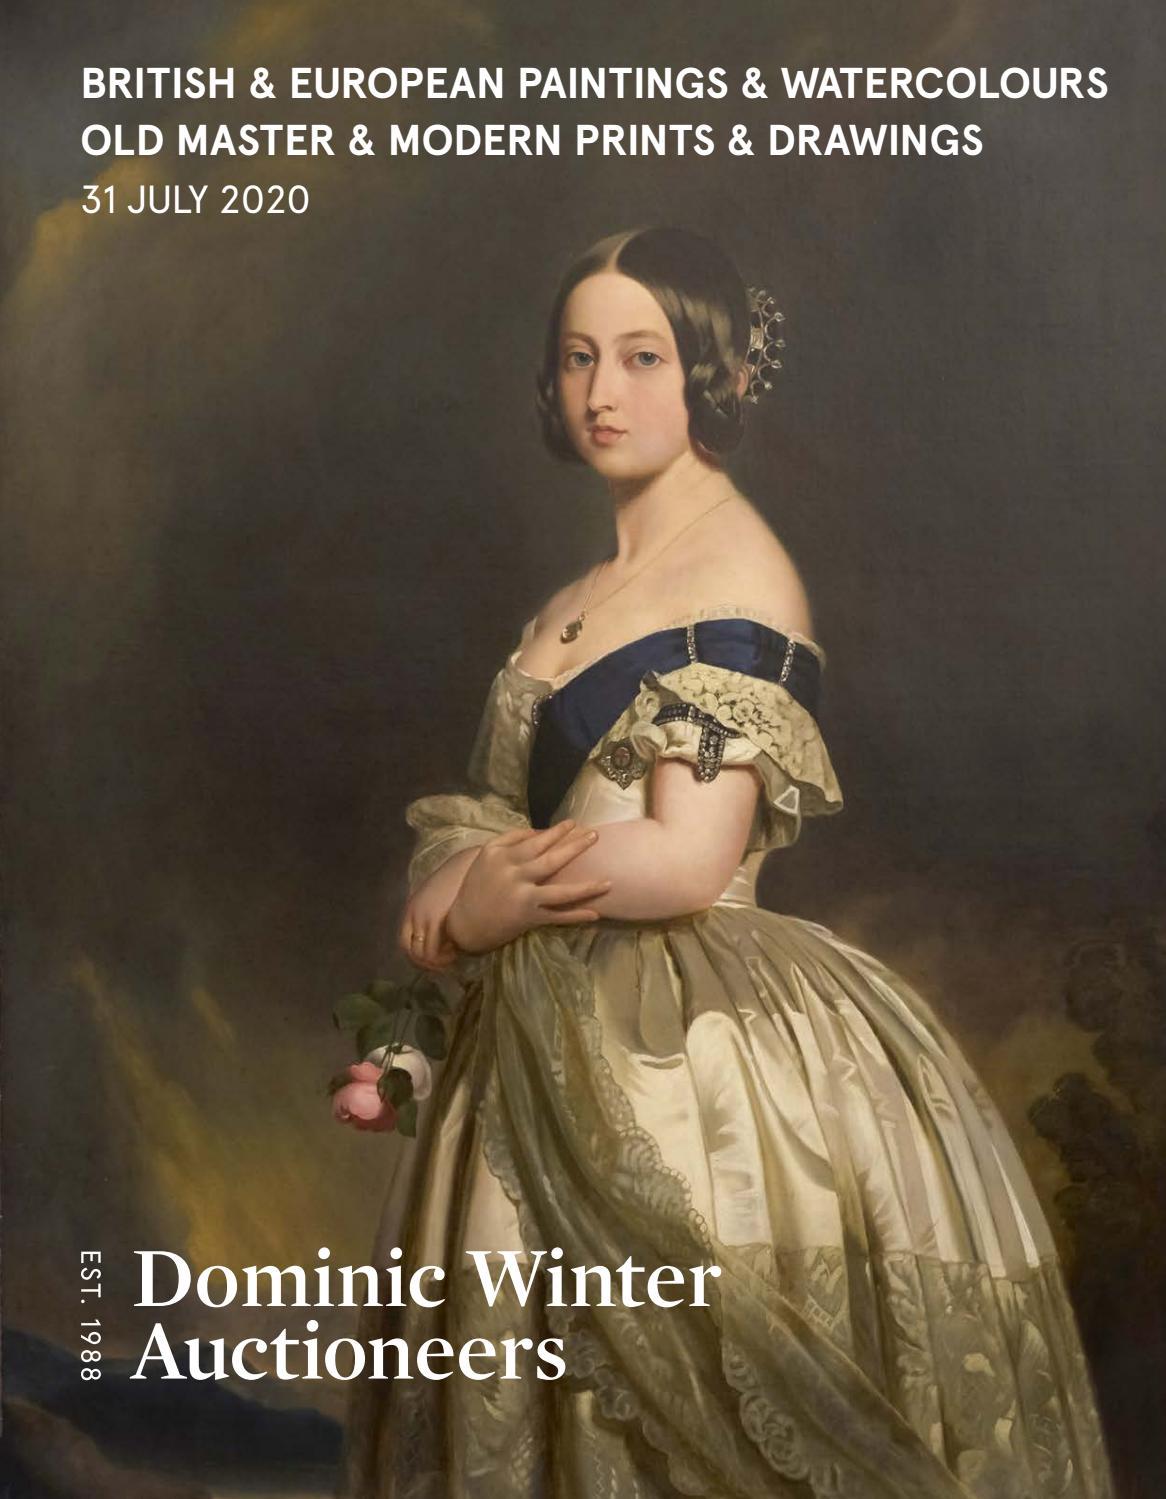 2020 Christmas Winter Velvent Linen Canvas Painting 79*58cm Round Diamond And Ab Diamond Dominic Winter Auctioneers by Jamm Design Ltd   issuu